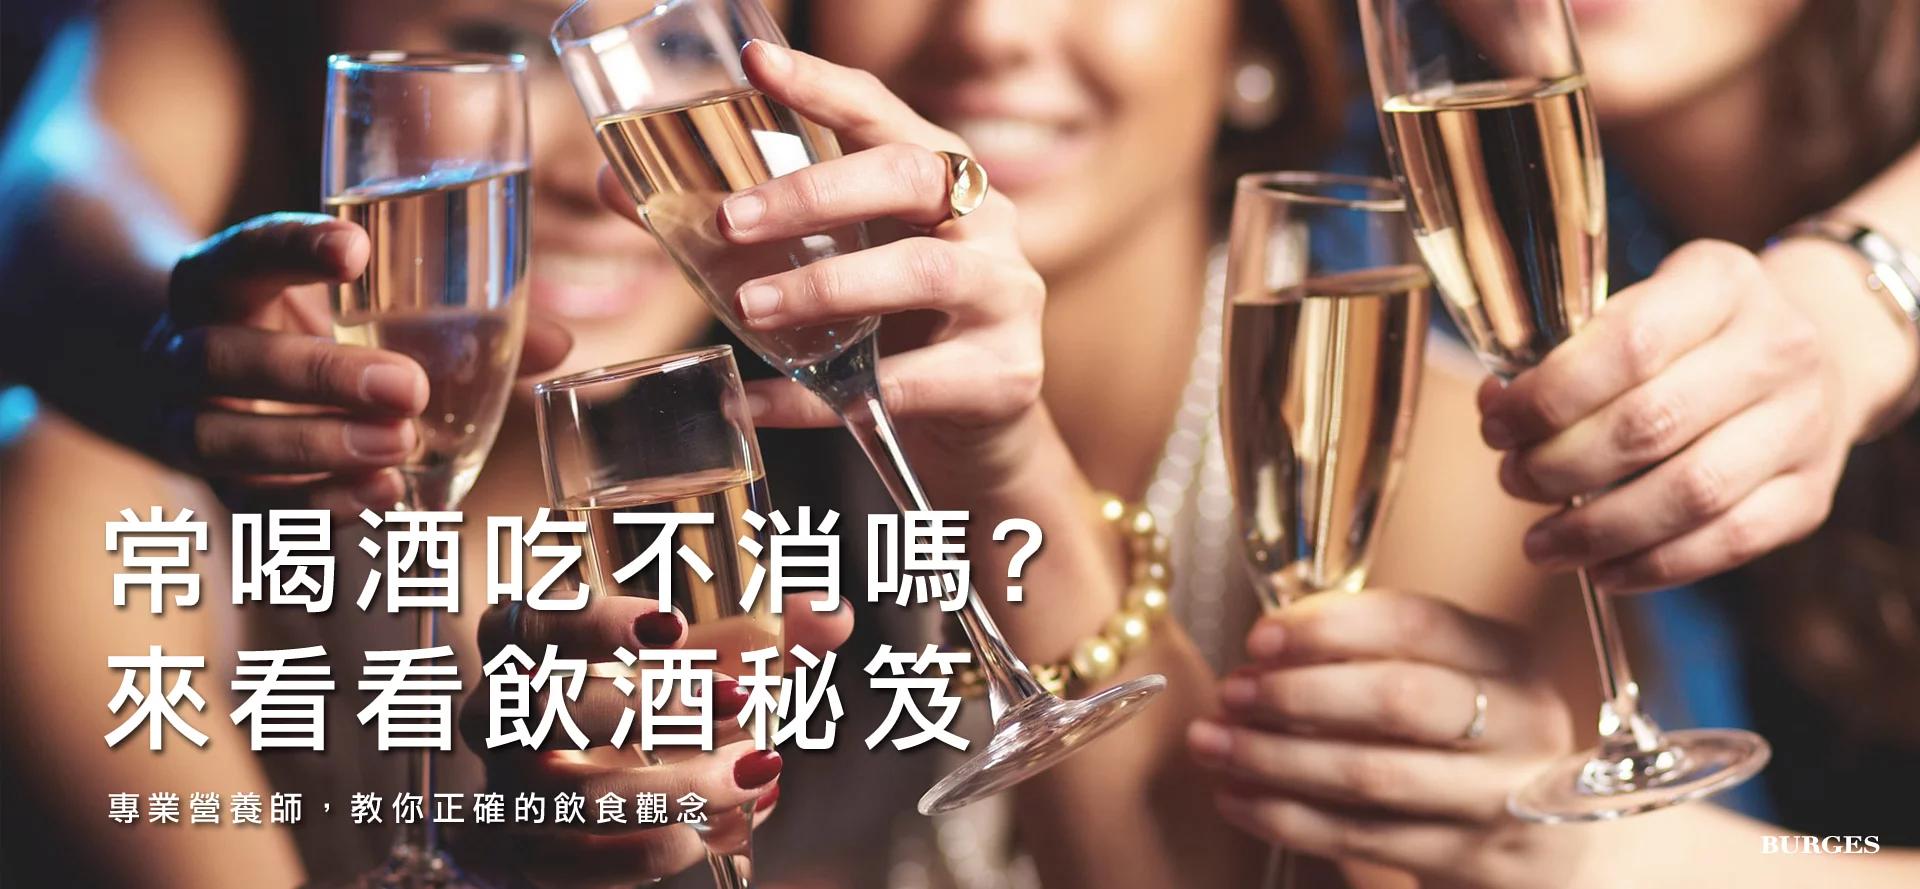 burges-blog-男士飲食調理-常喝酒吃不消嗎?來看看飲酒秘笈